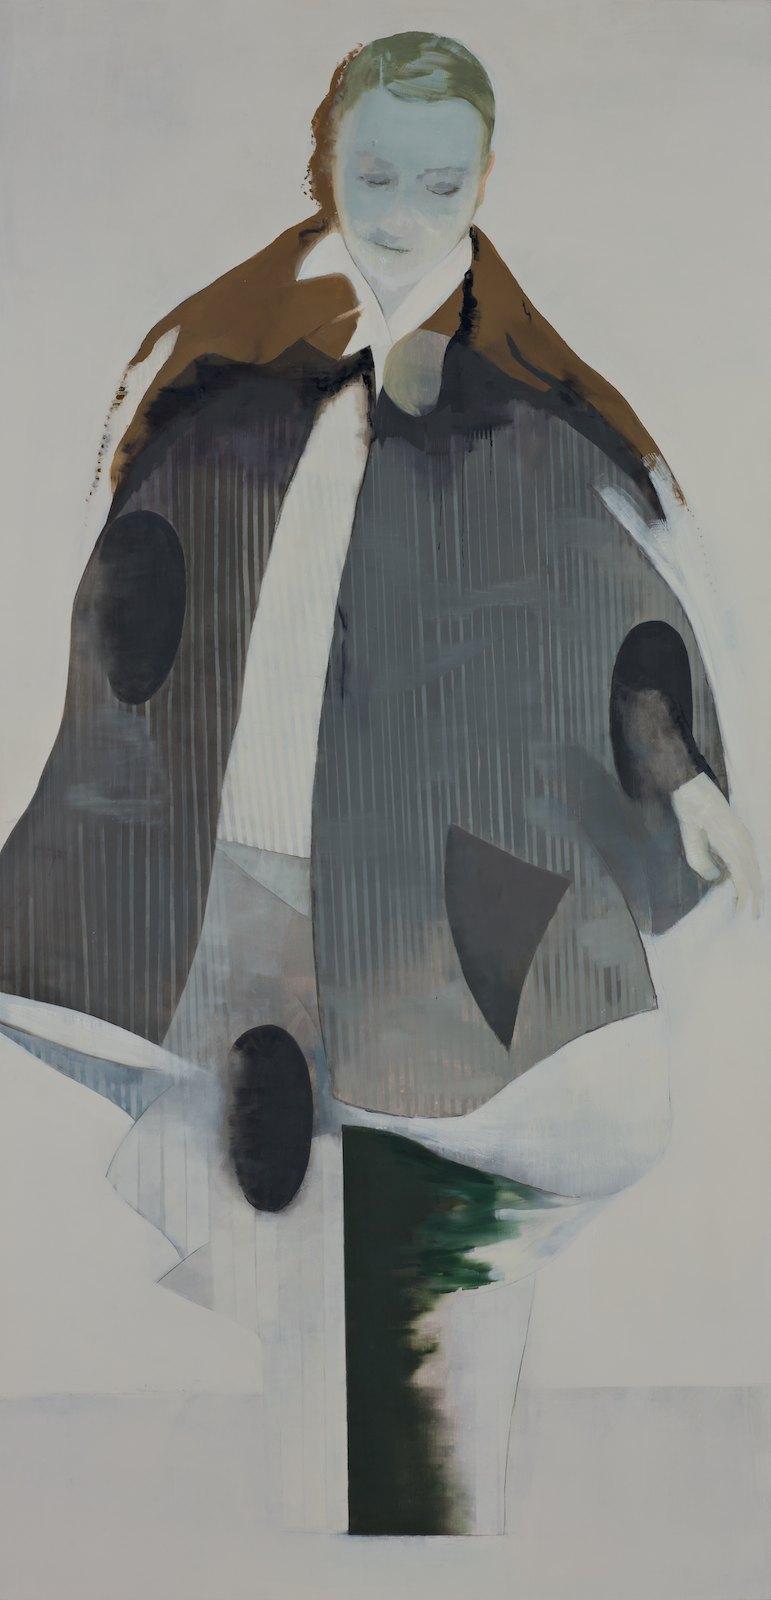 The Else Wren, 2012, oil on canvas over panel, 198,5 x 97